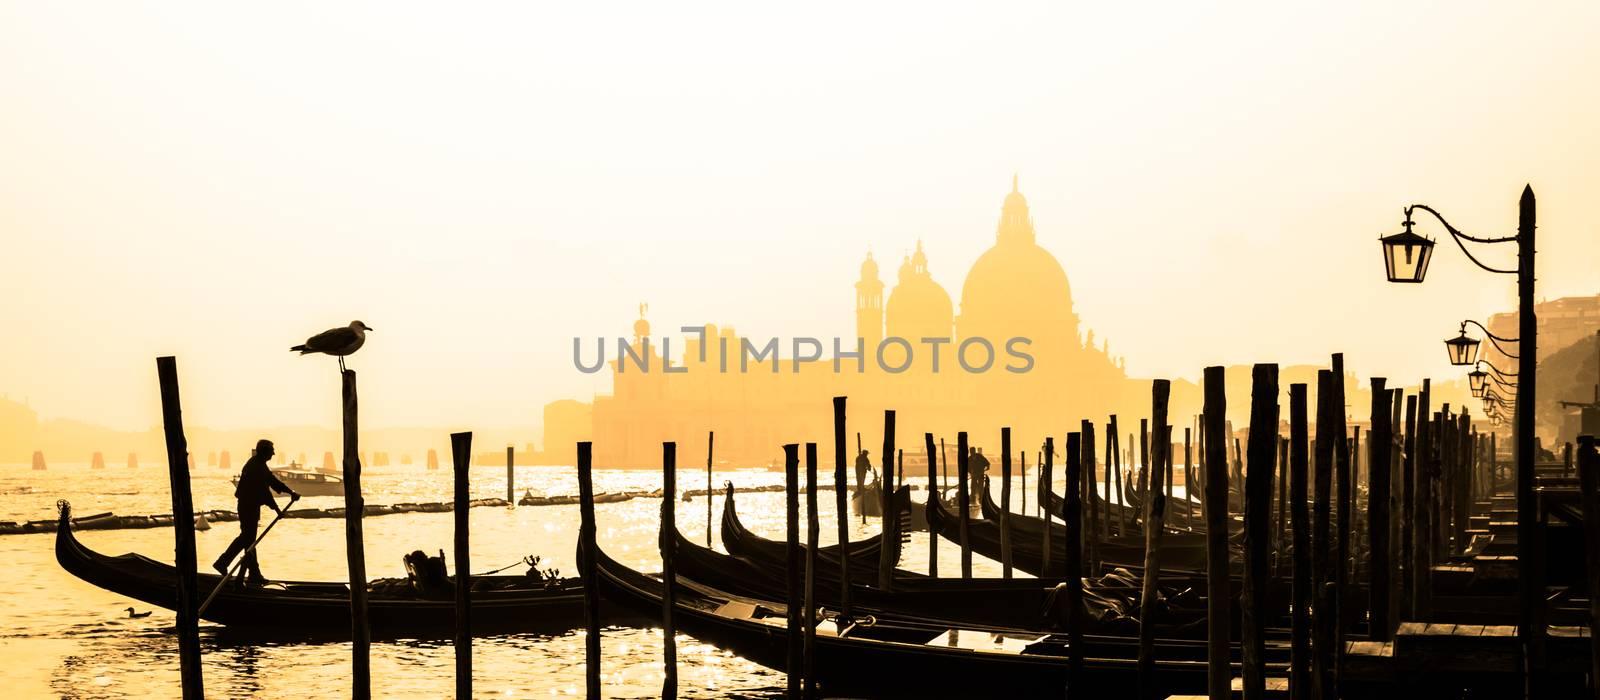 Romantic Italian city of Venice, a World Heritage Site: traditional Venetian wooden boats, gondolier and Roman Catholic church Basilica di Santa Maria della Salute in the misty background.